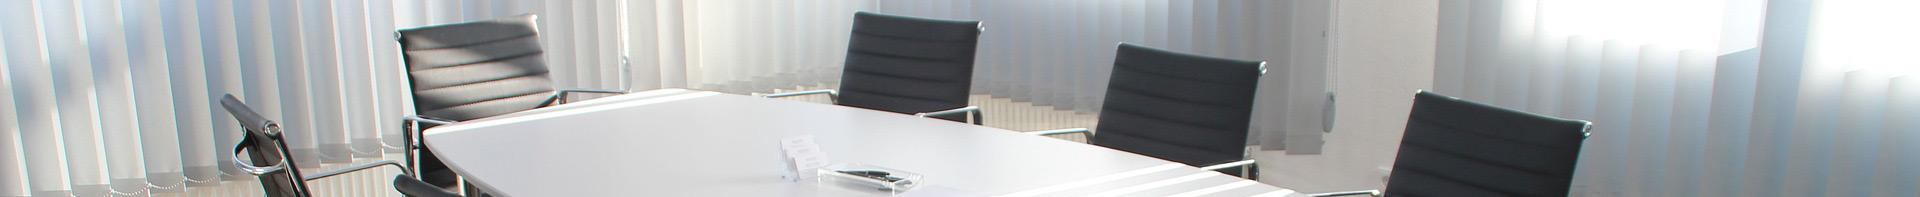 g-s-immobilien - Kontaktformular